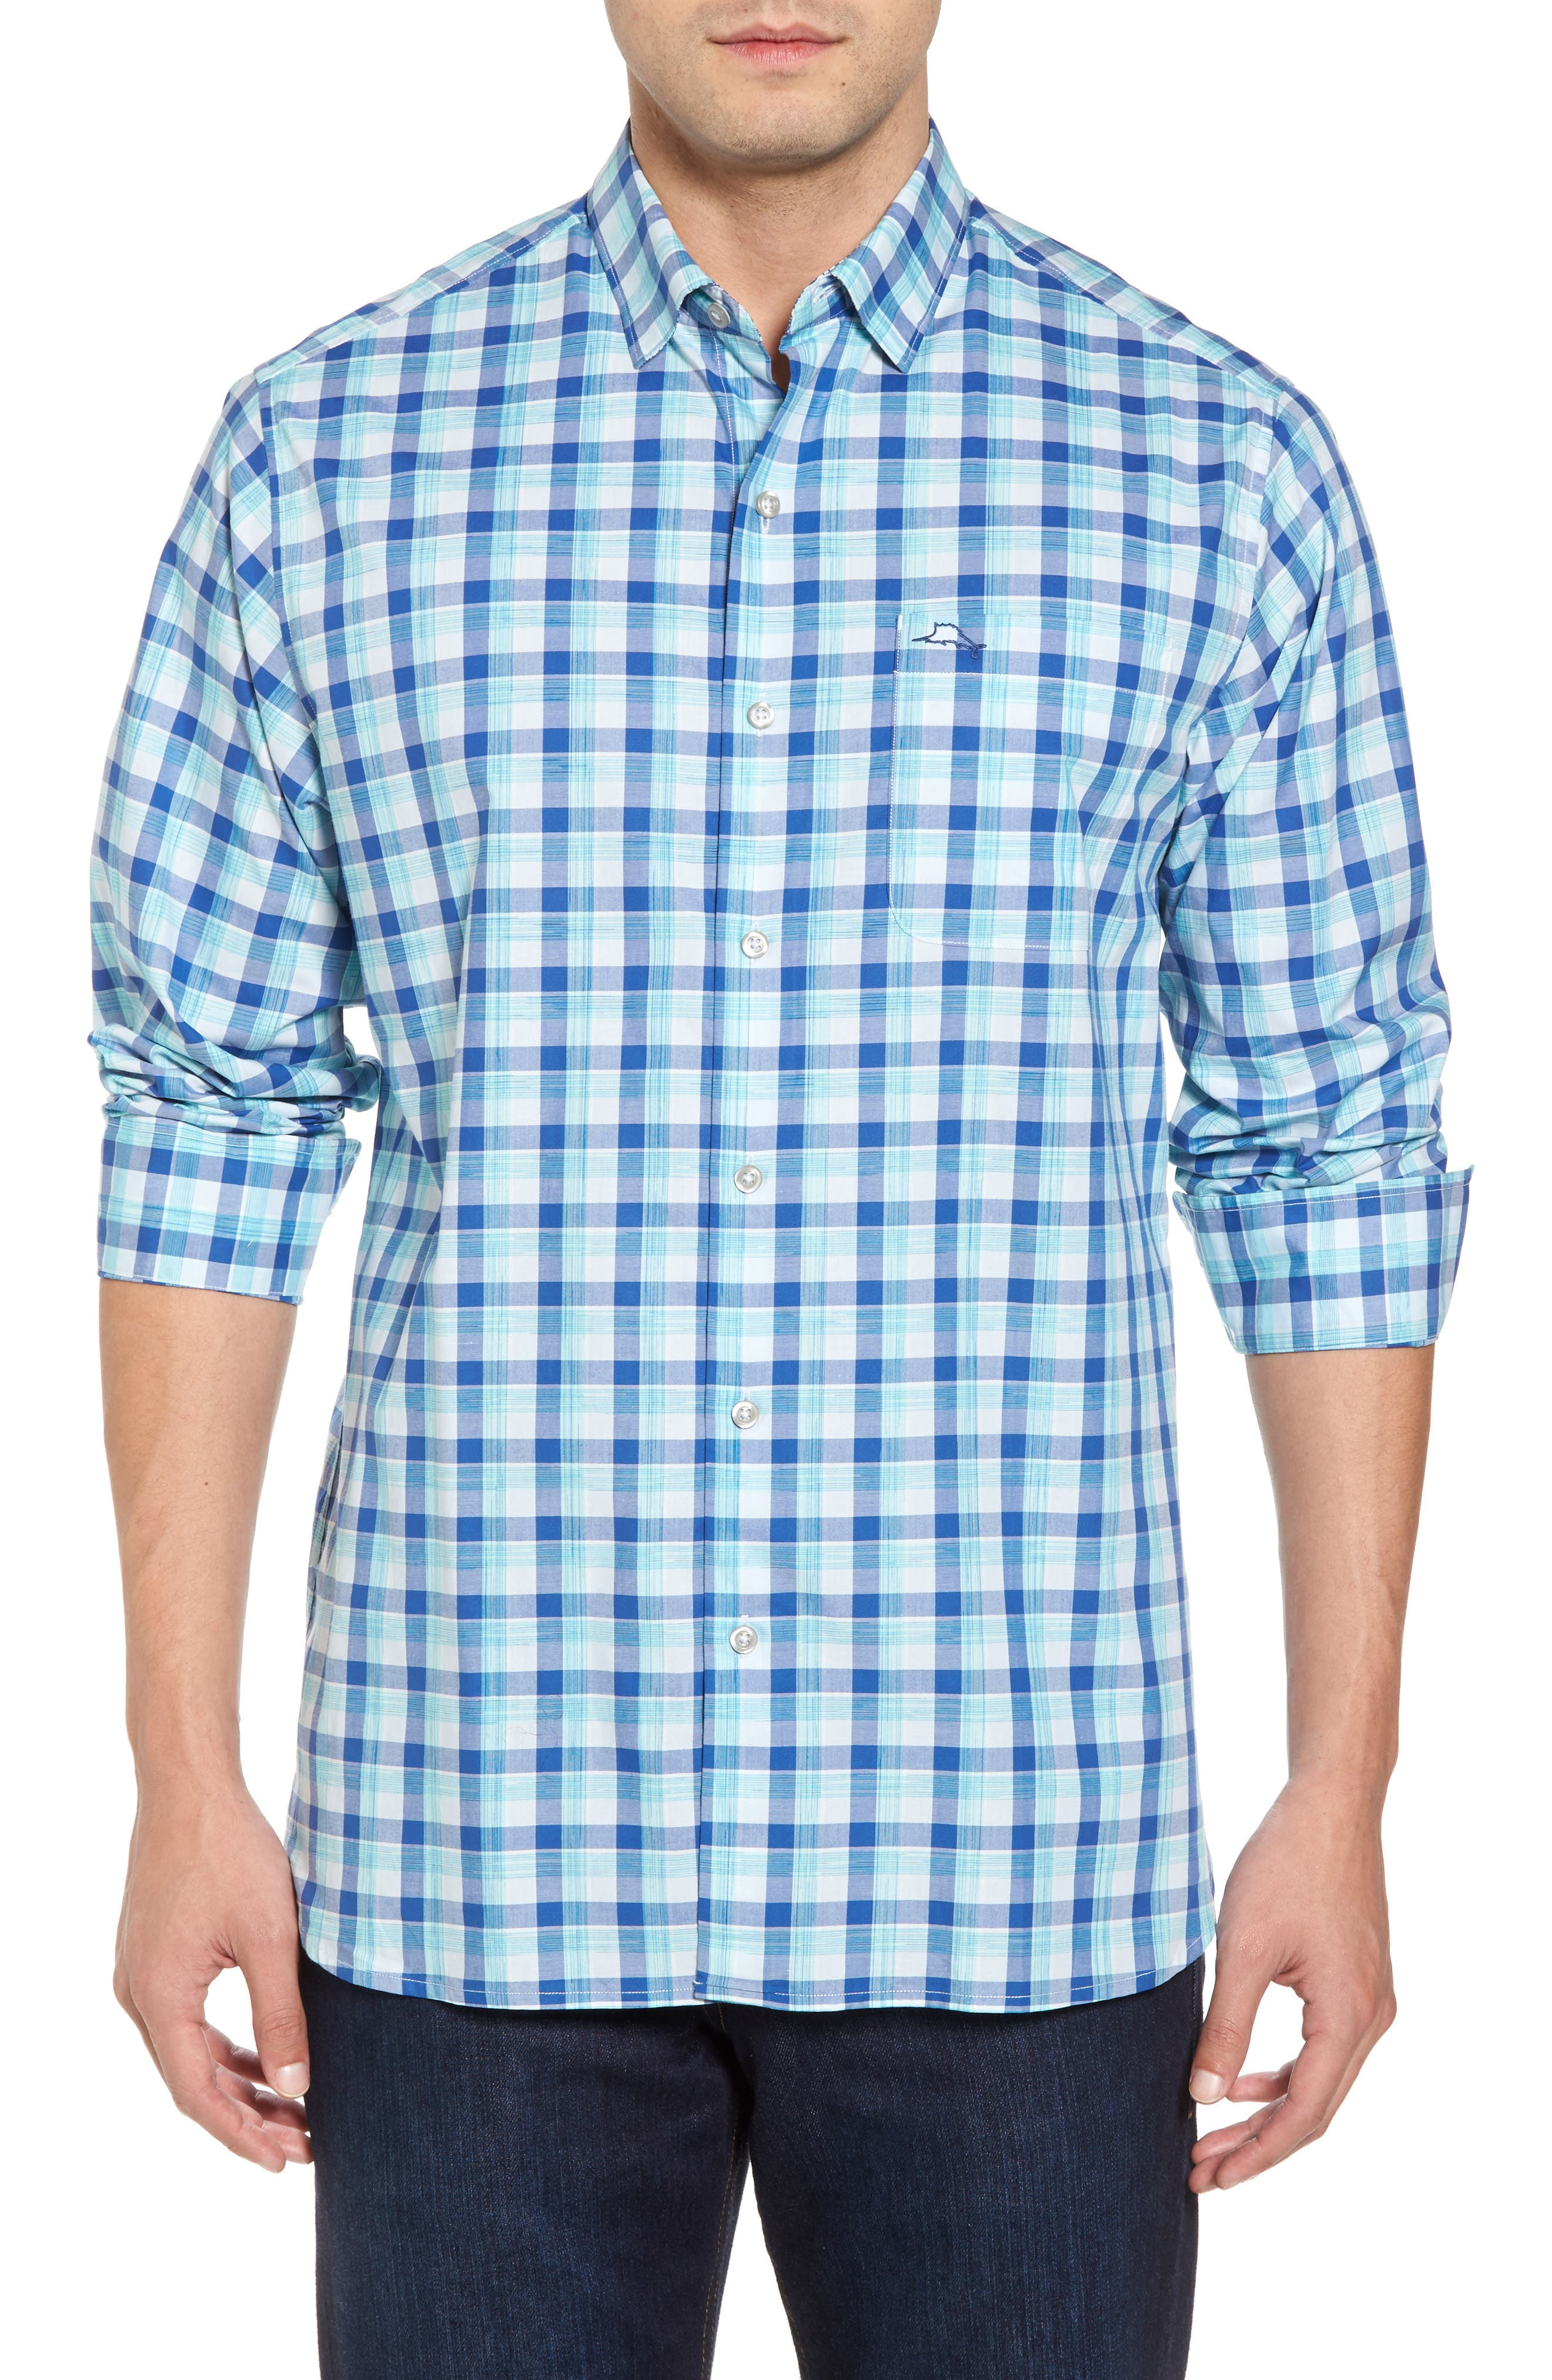 Atlantic Tides Classic Fit Plaid Sport Shirt,                             Main thumbnail 1, color,                             Galaxy Blue